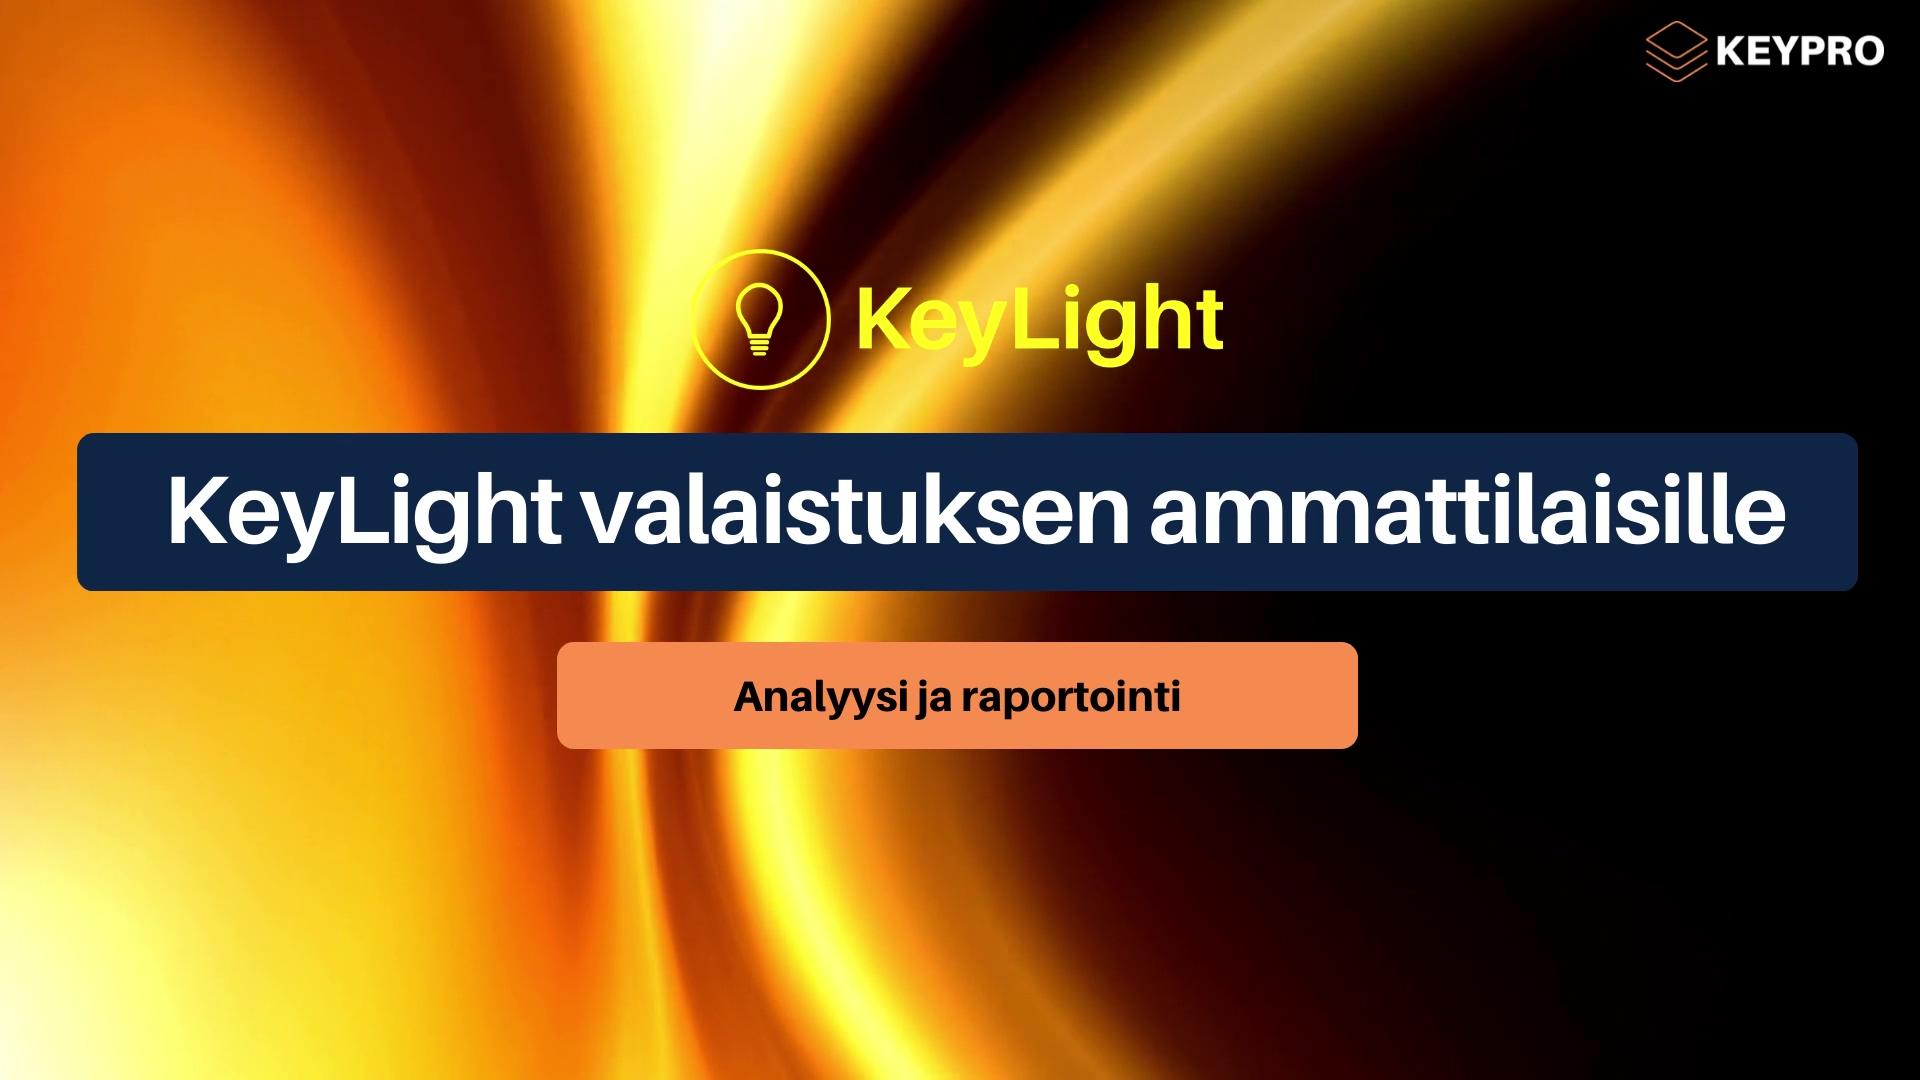 KeyLight FI marketing video 2021